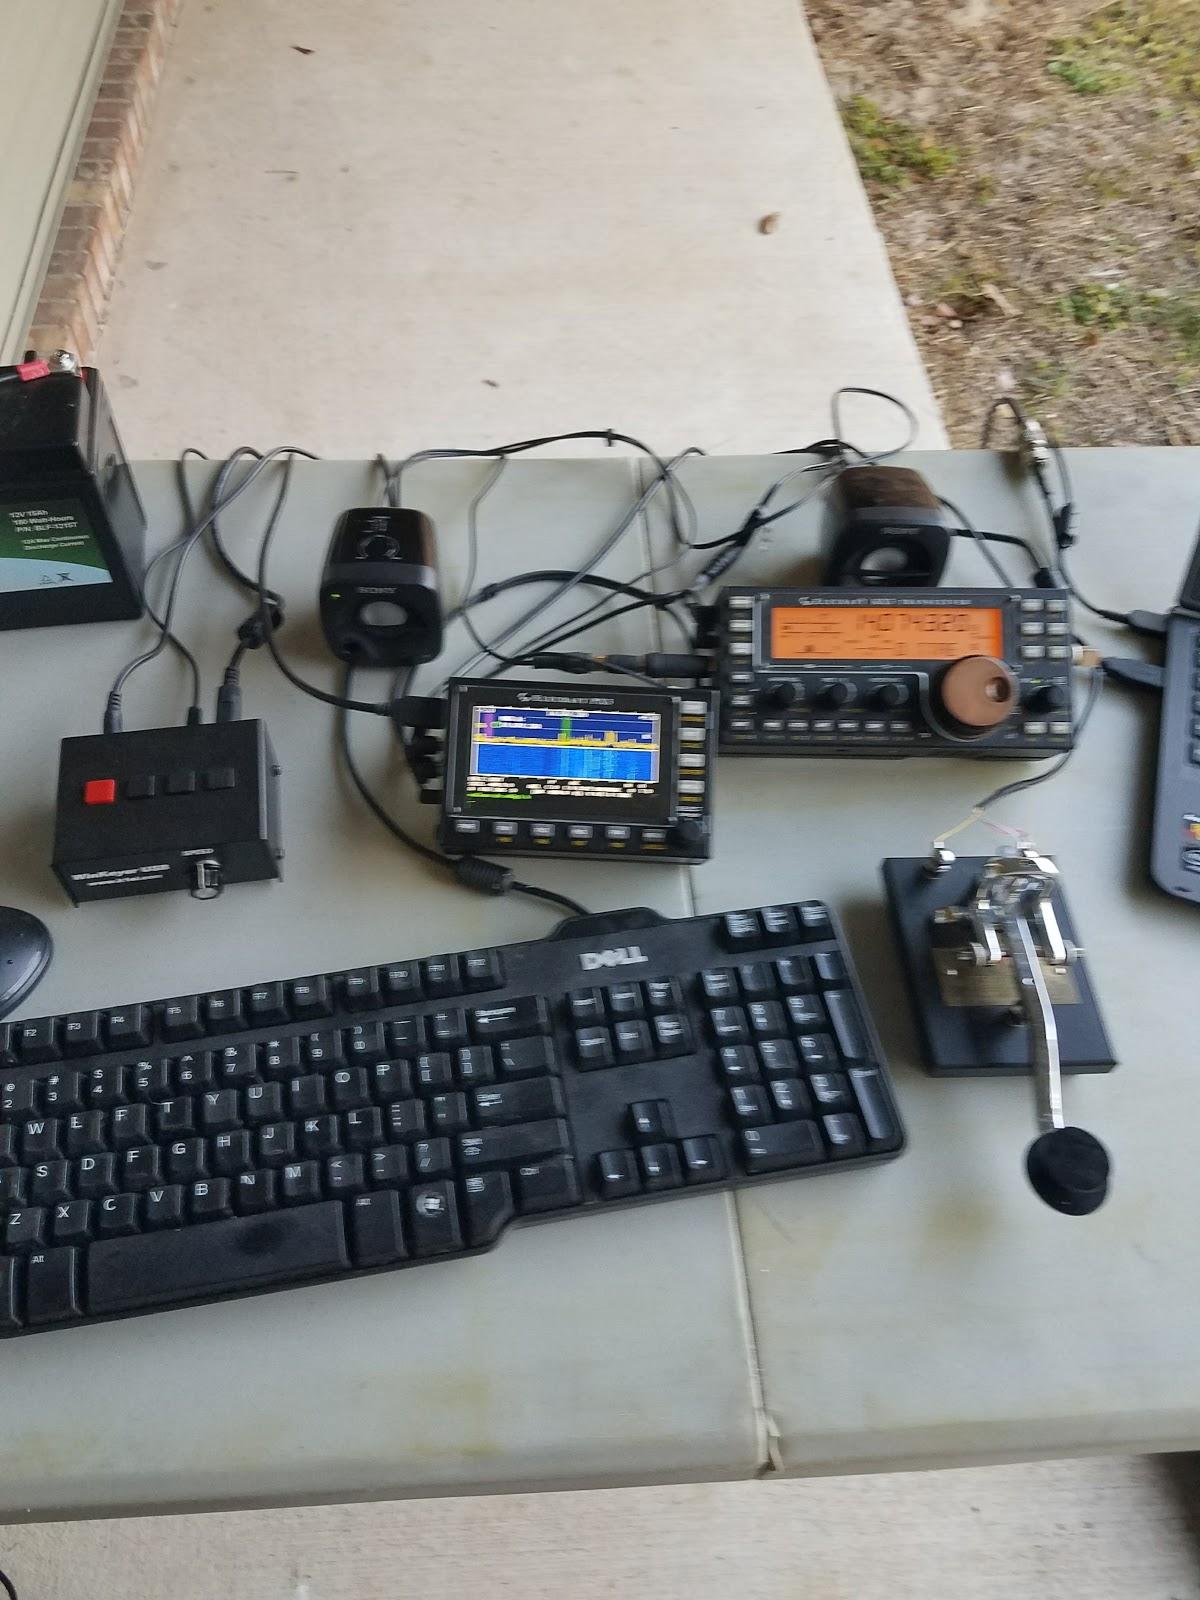 N4KGL - RaDAR: Building a QRP Field Day Station